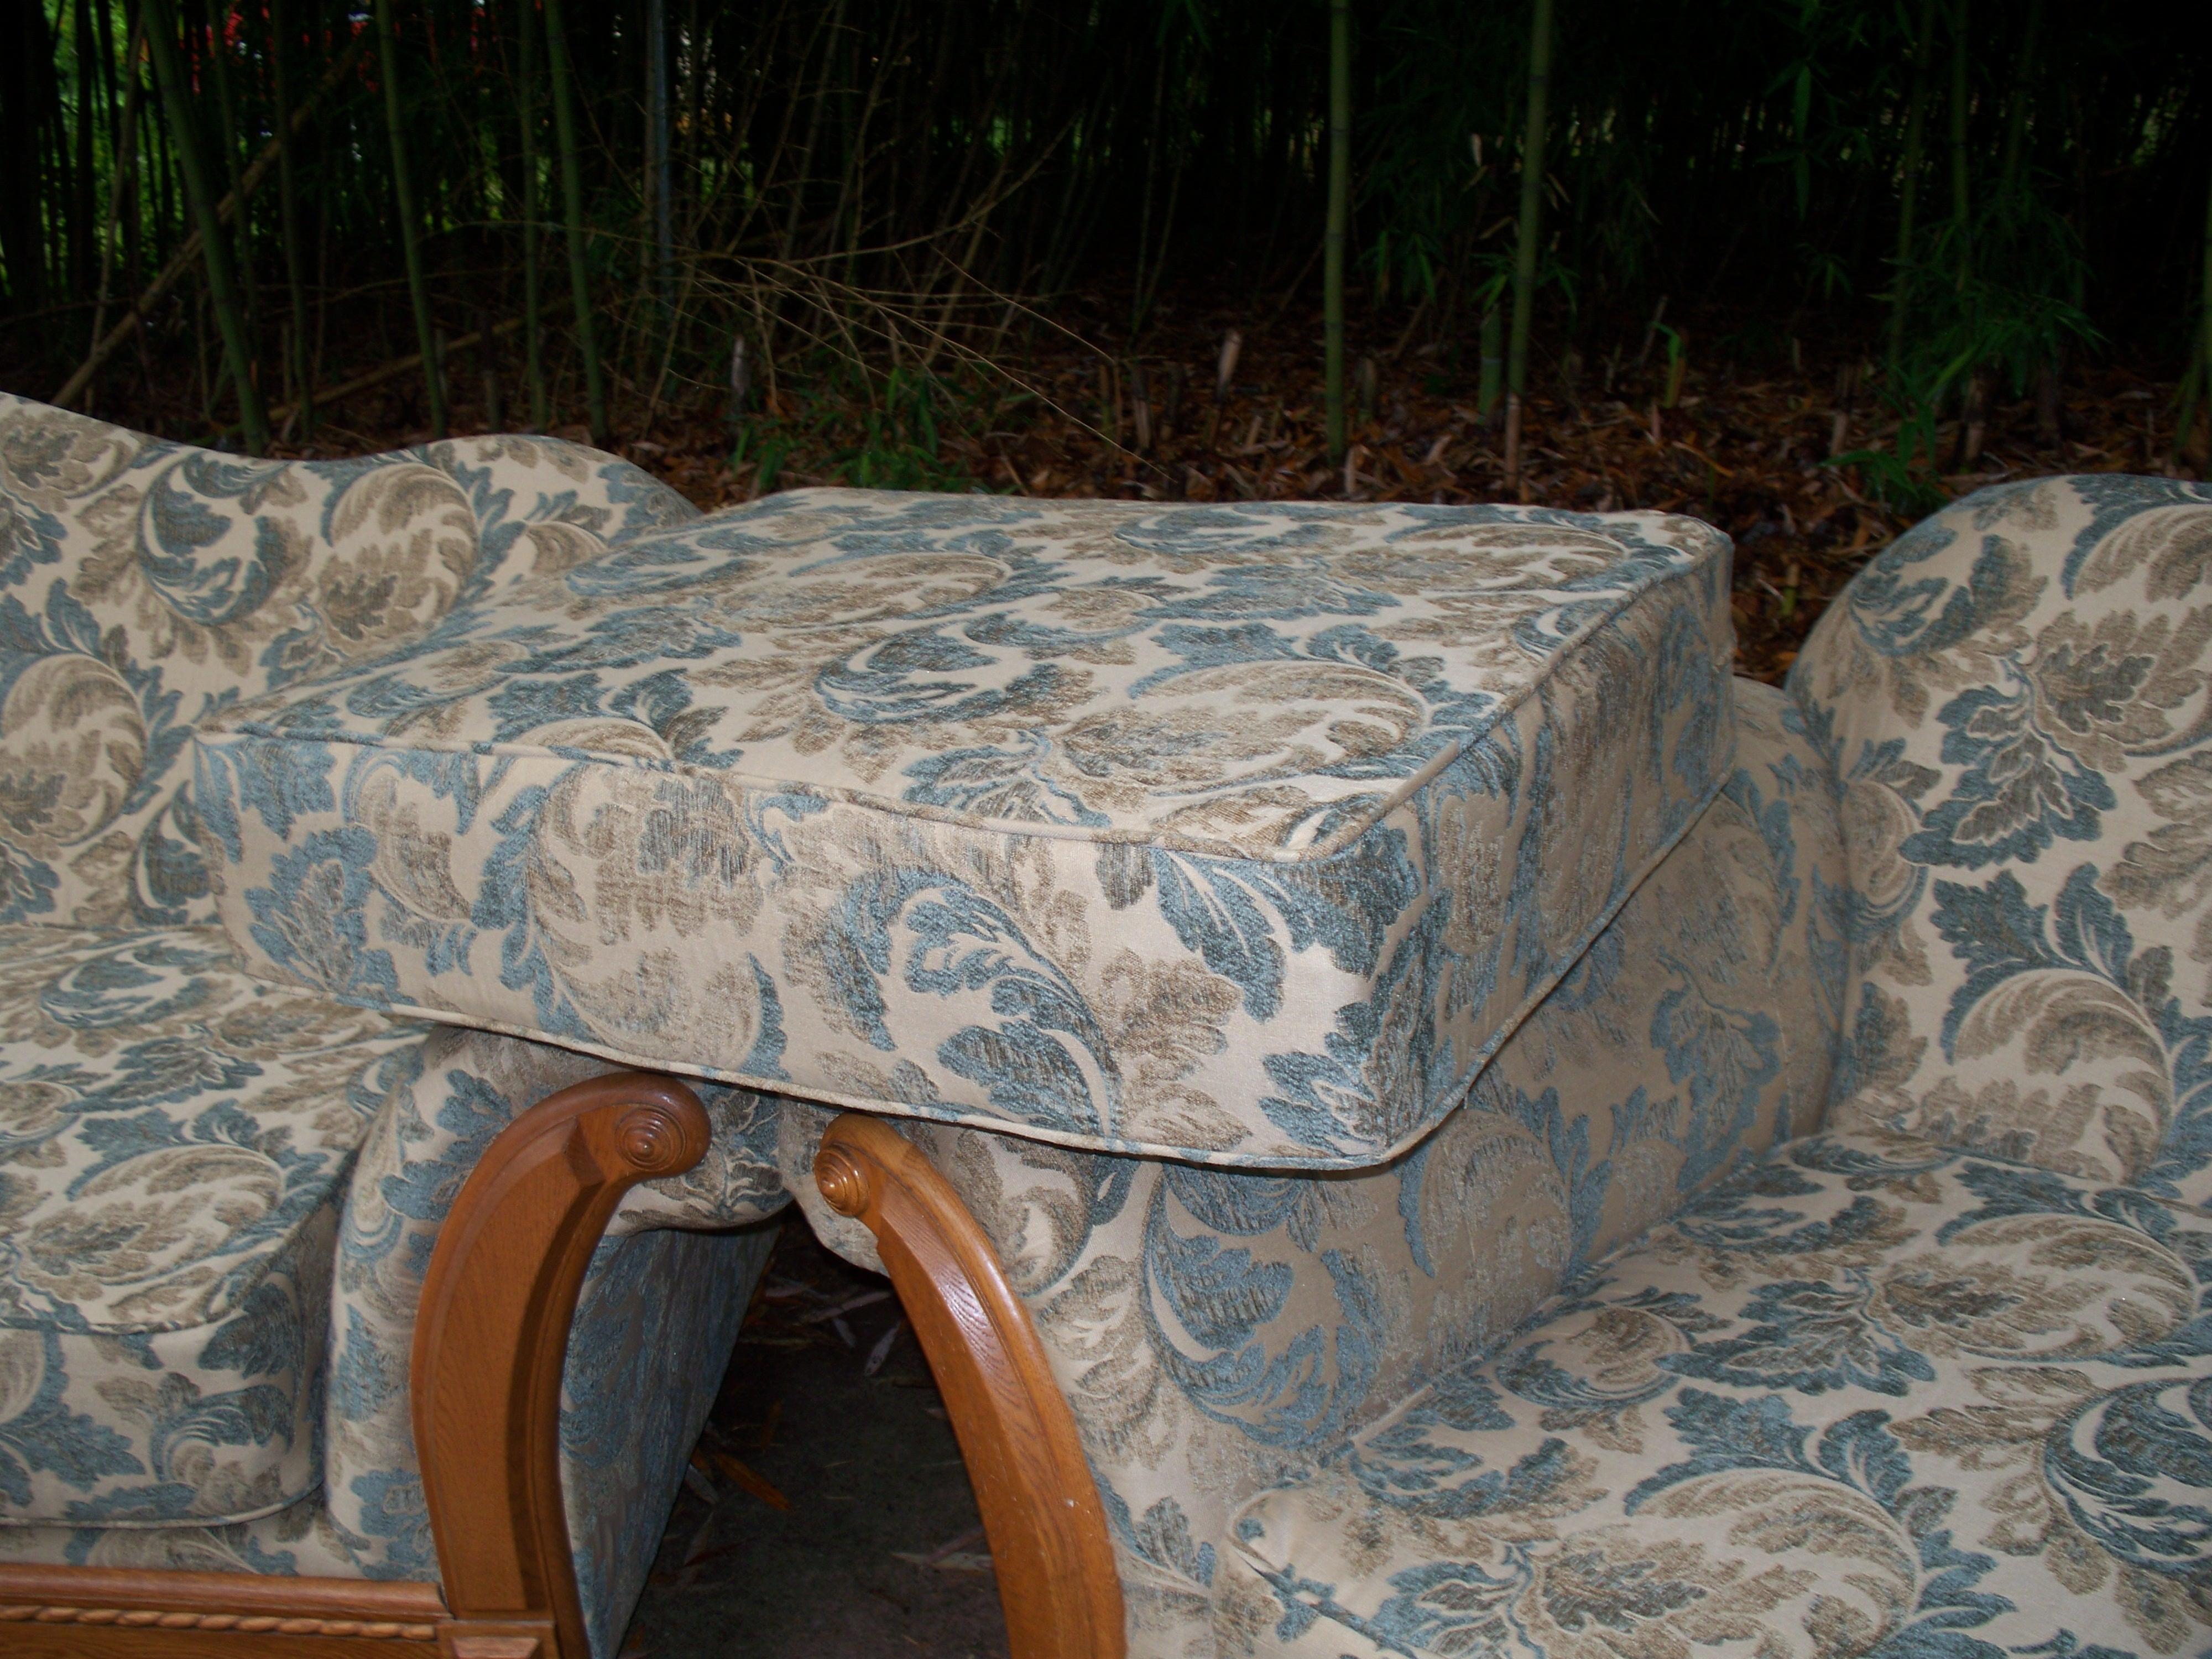 Stuff It Upholstery,  Foam Rubber, Church Pew Upholstering